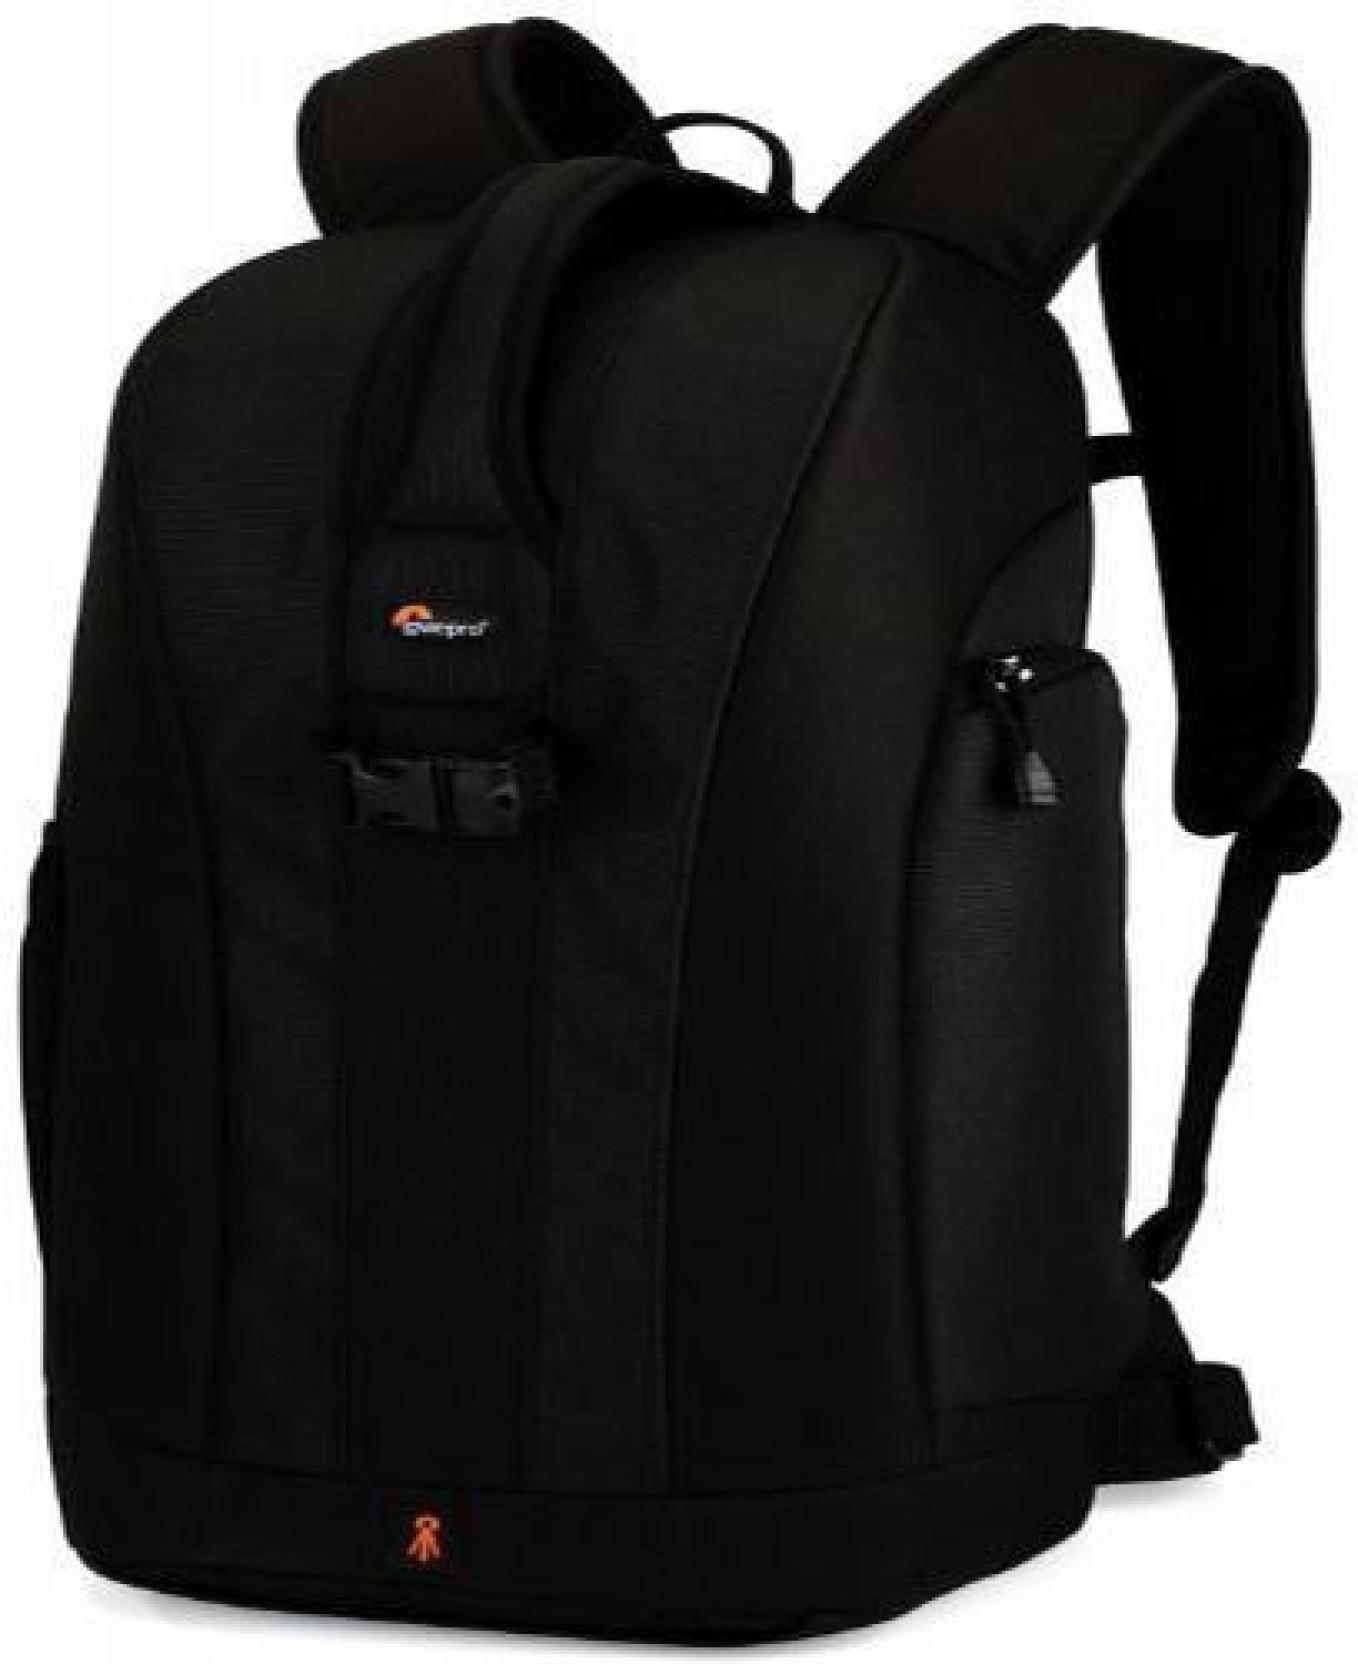 Lowepro Flipside 300 Dslr Camera Bag Video Pack 250aw Share